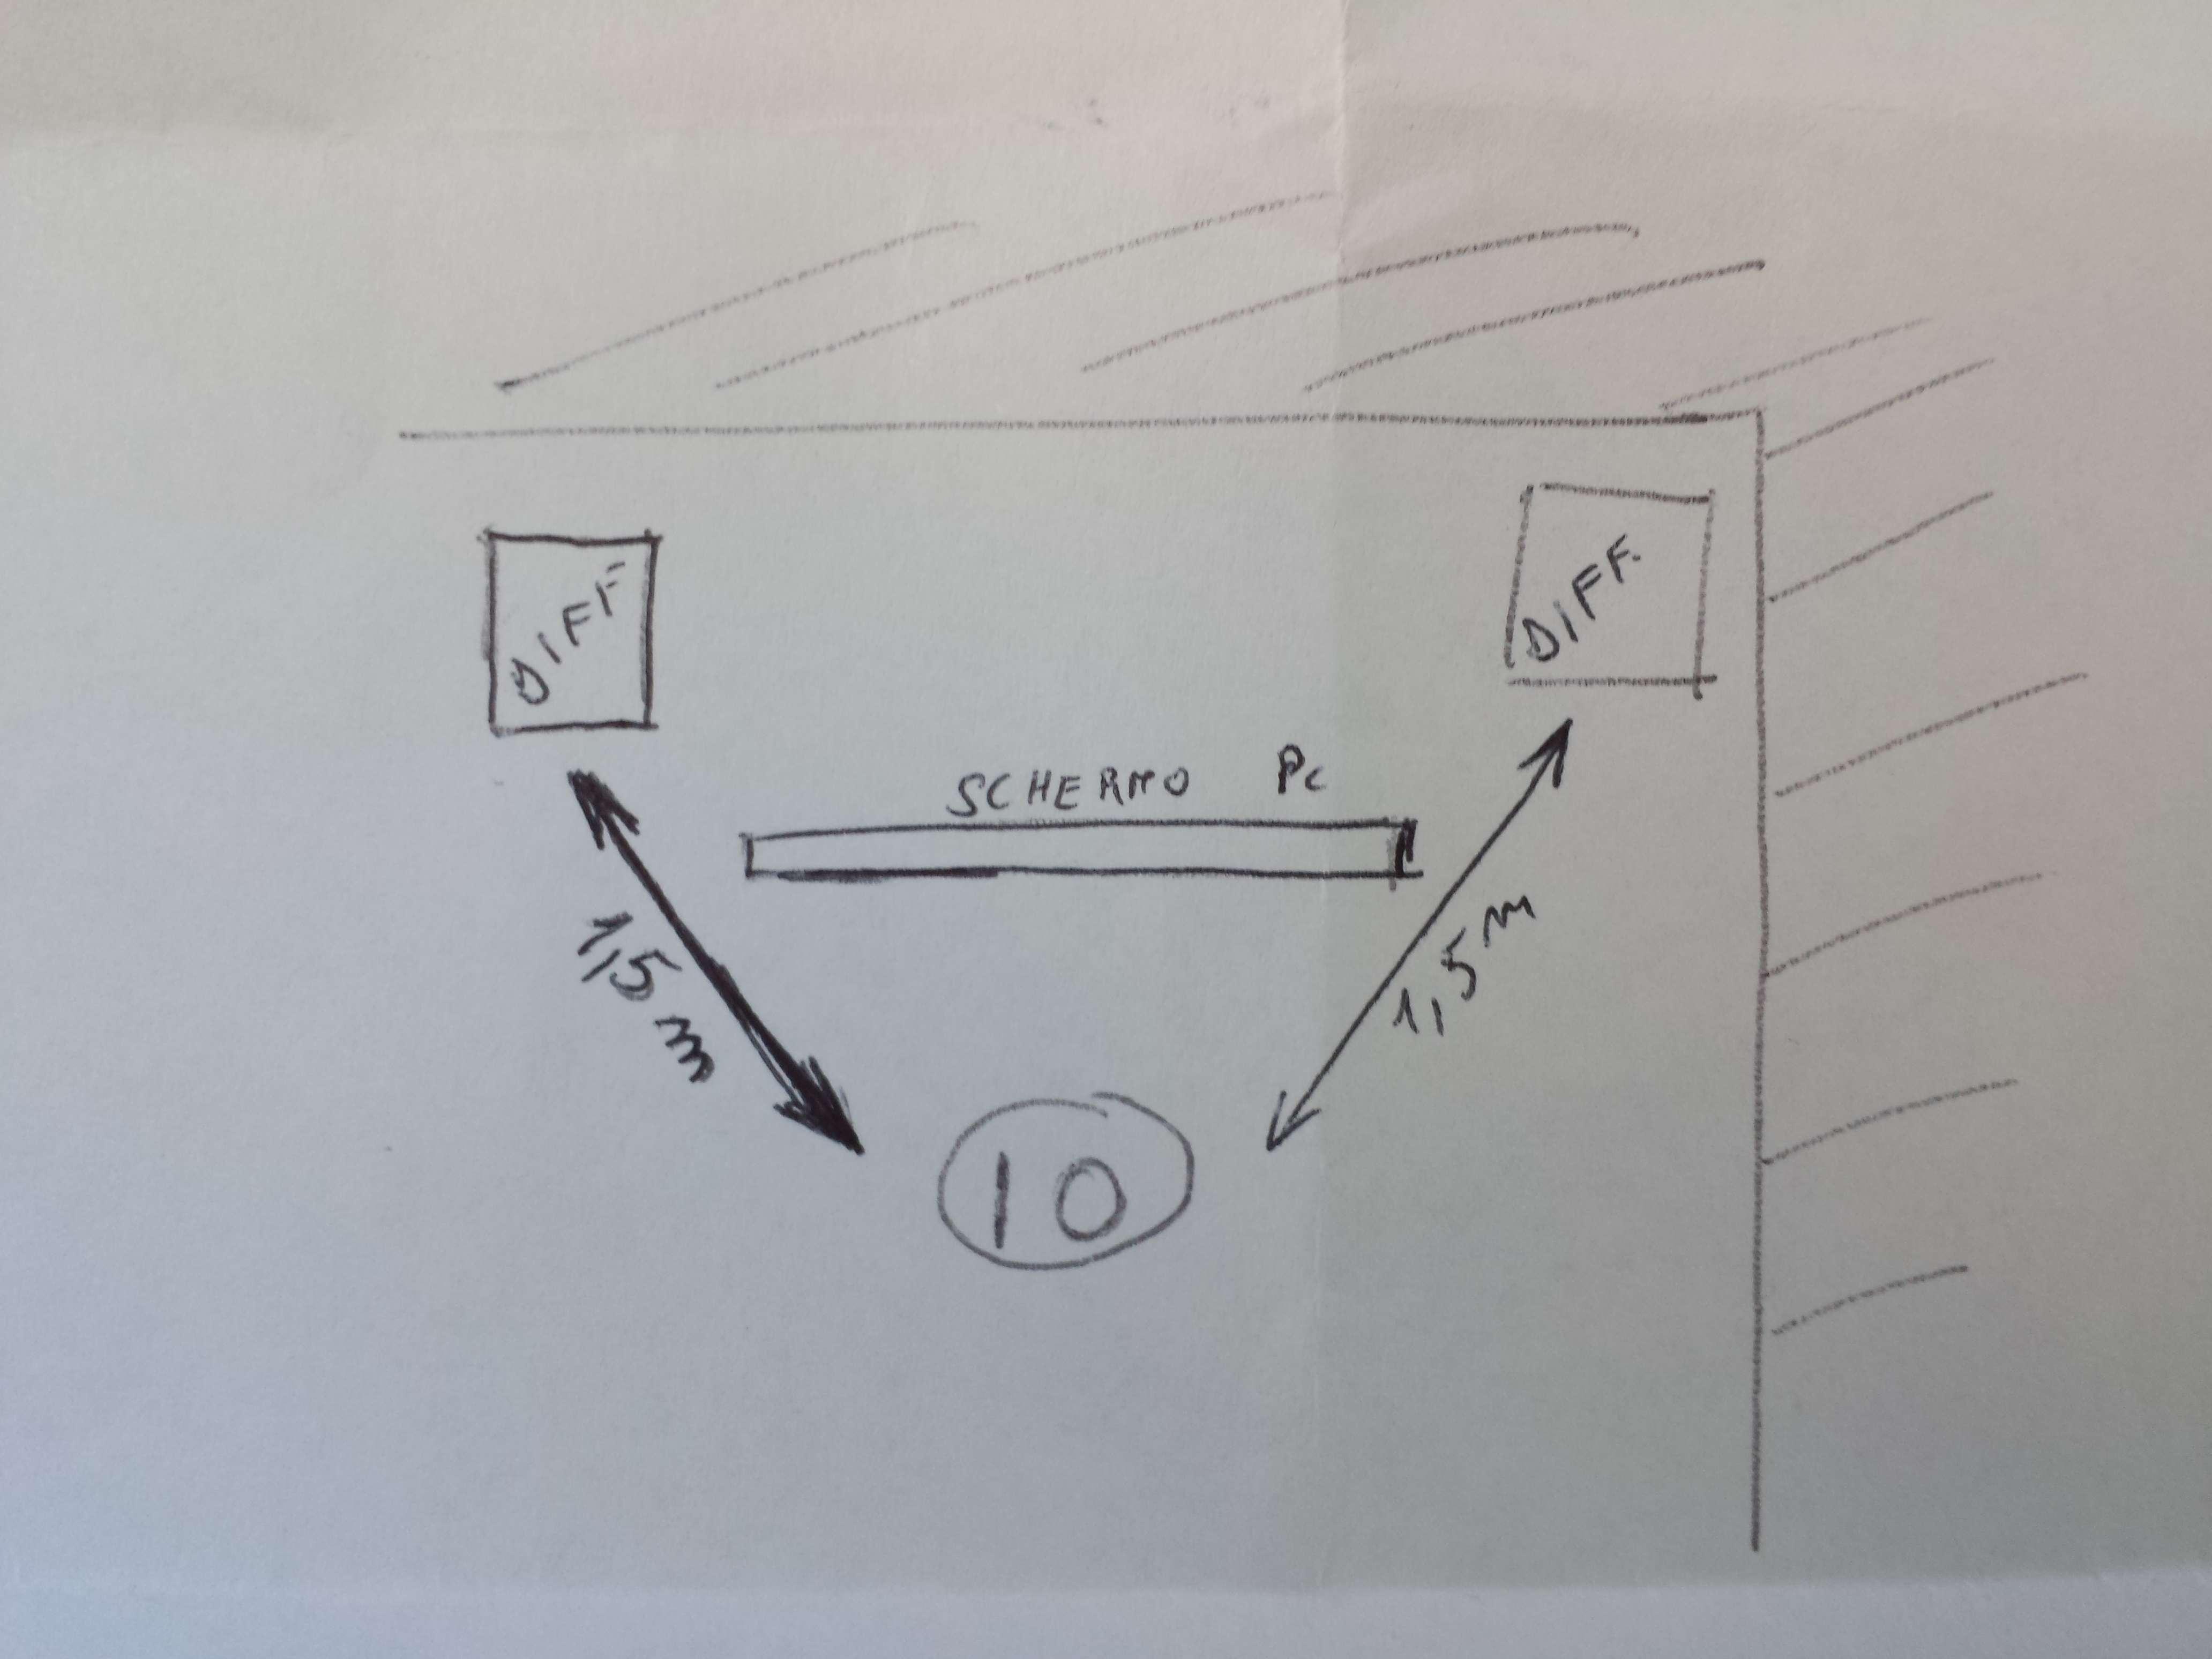 indiana line tesi 260 vs wharfedale diamond 10.2 20141110